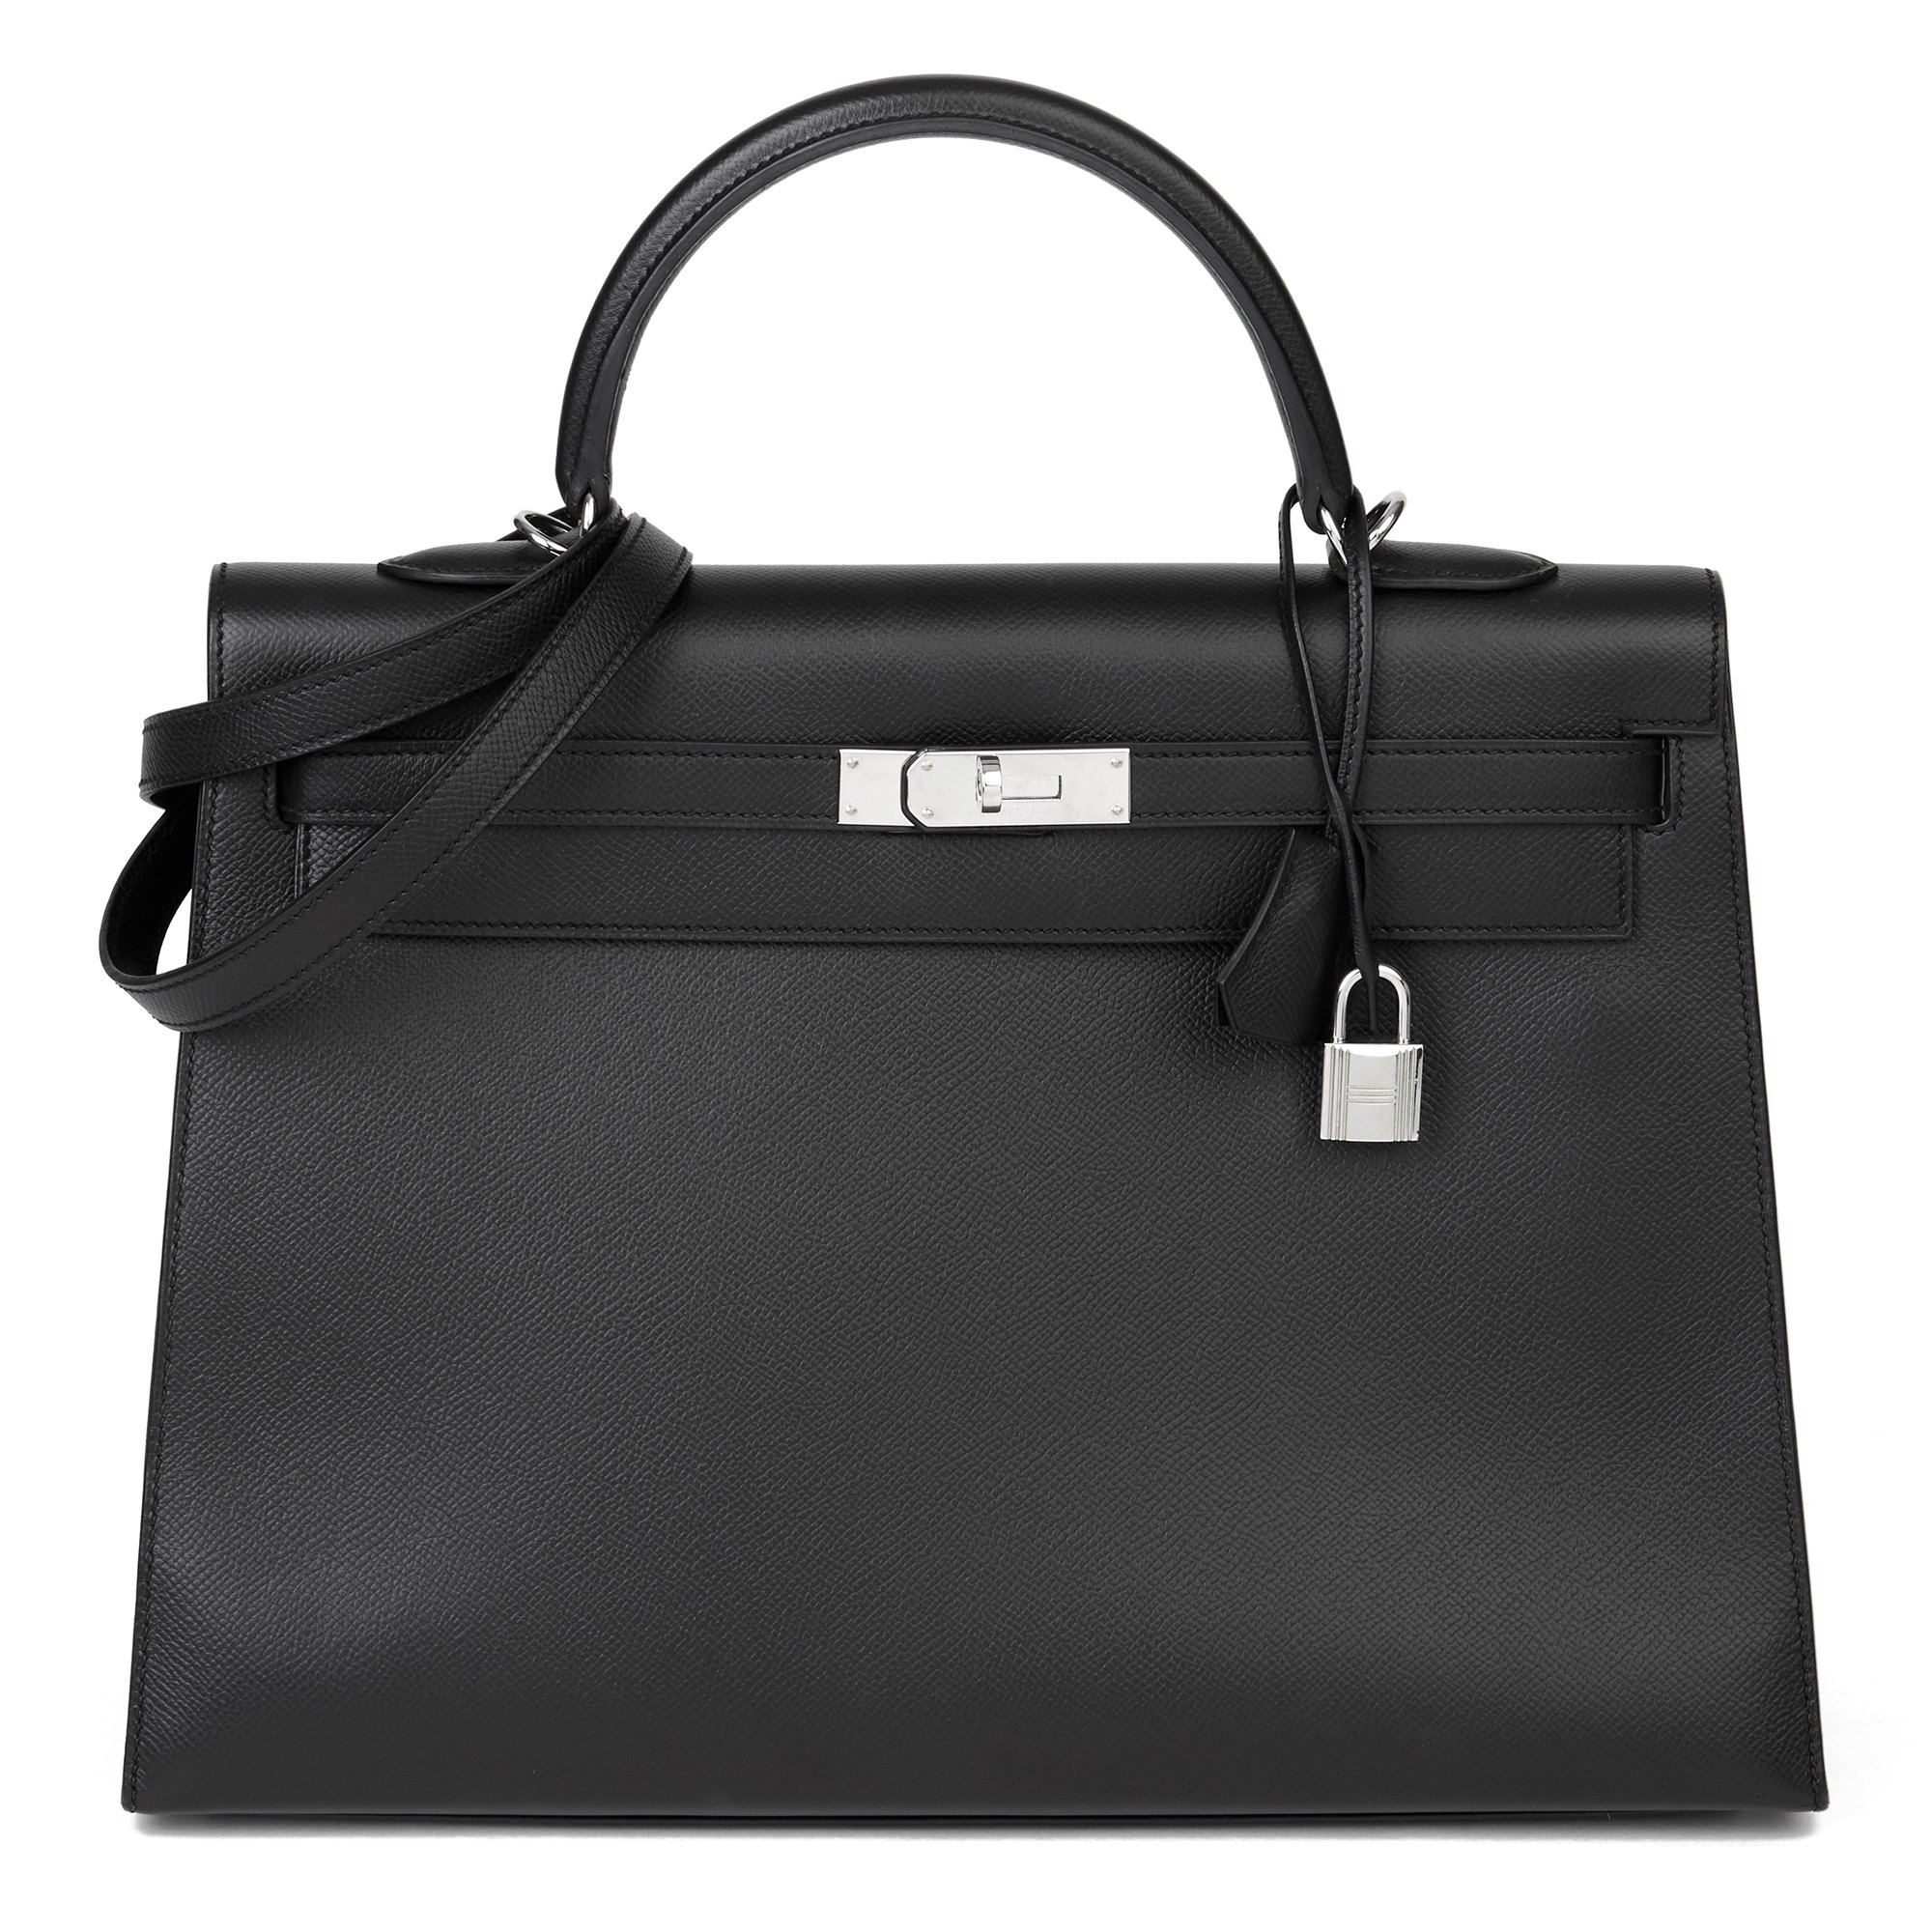 Hermès Black Epsom Leather Kelly 35cm Sellier